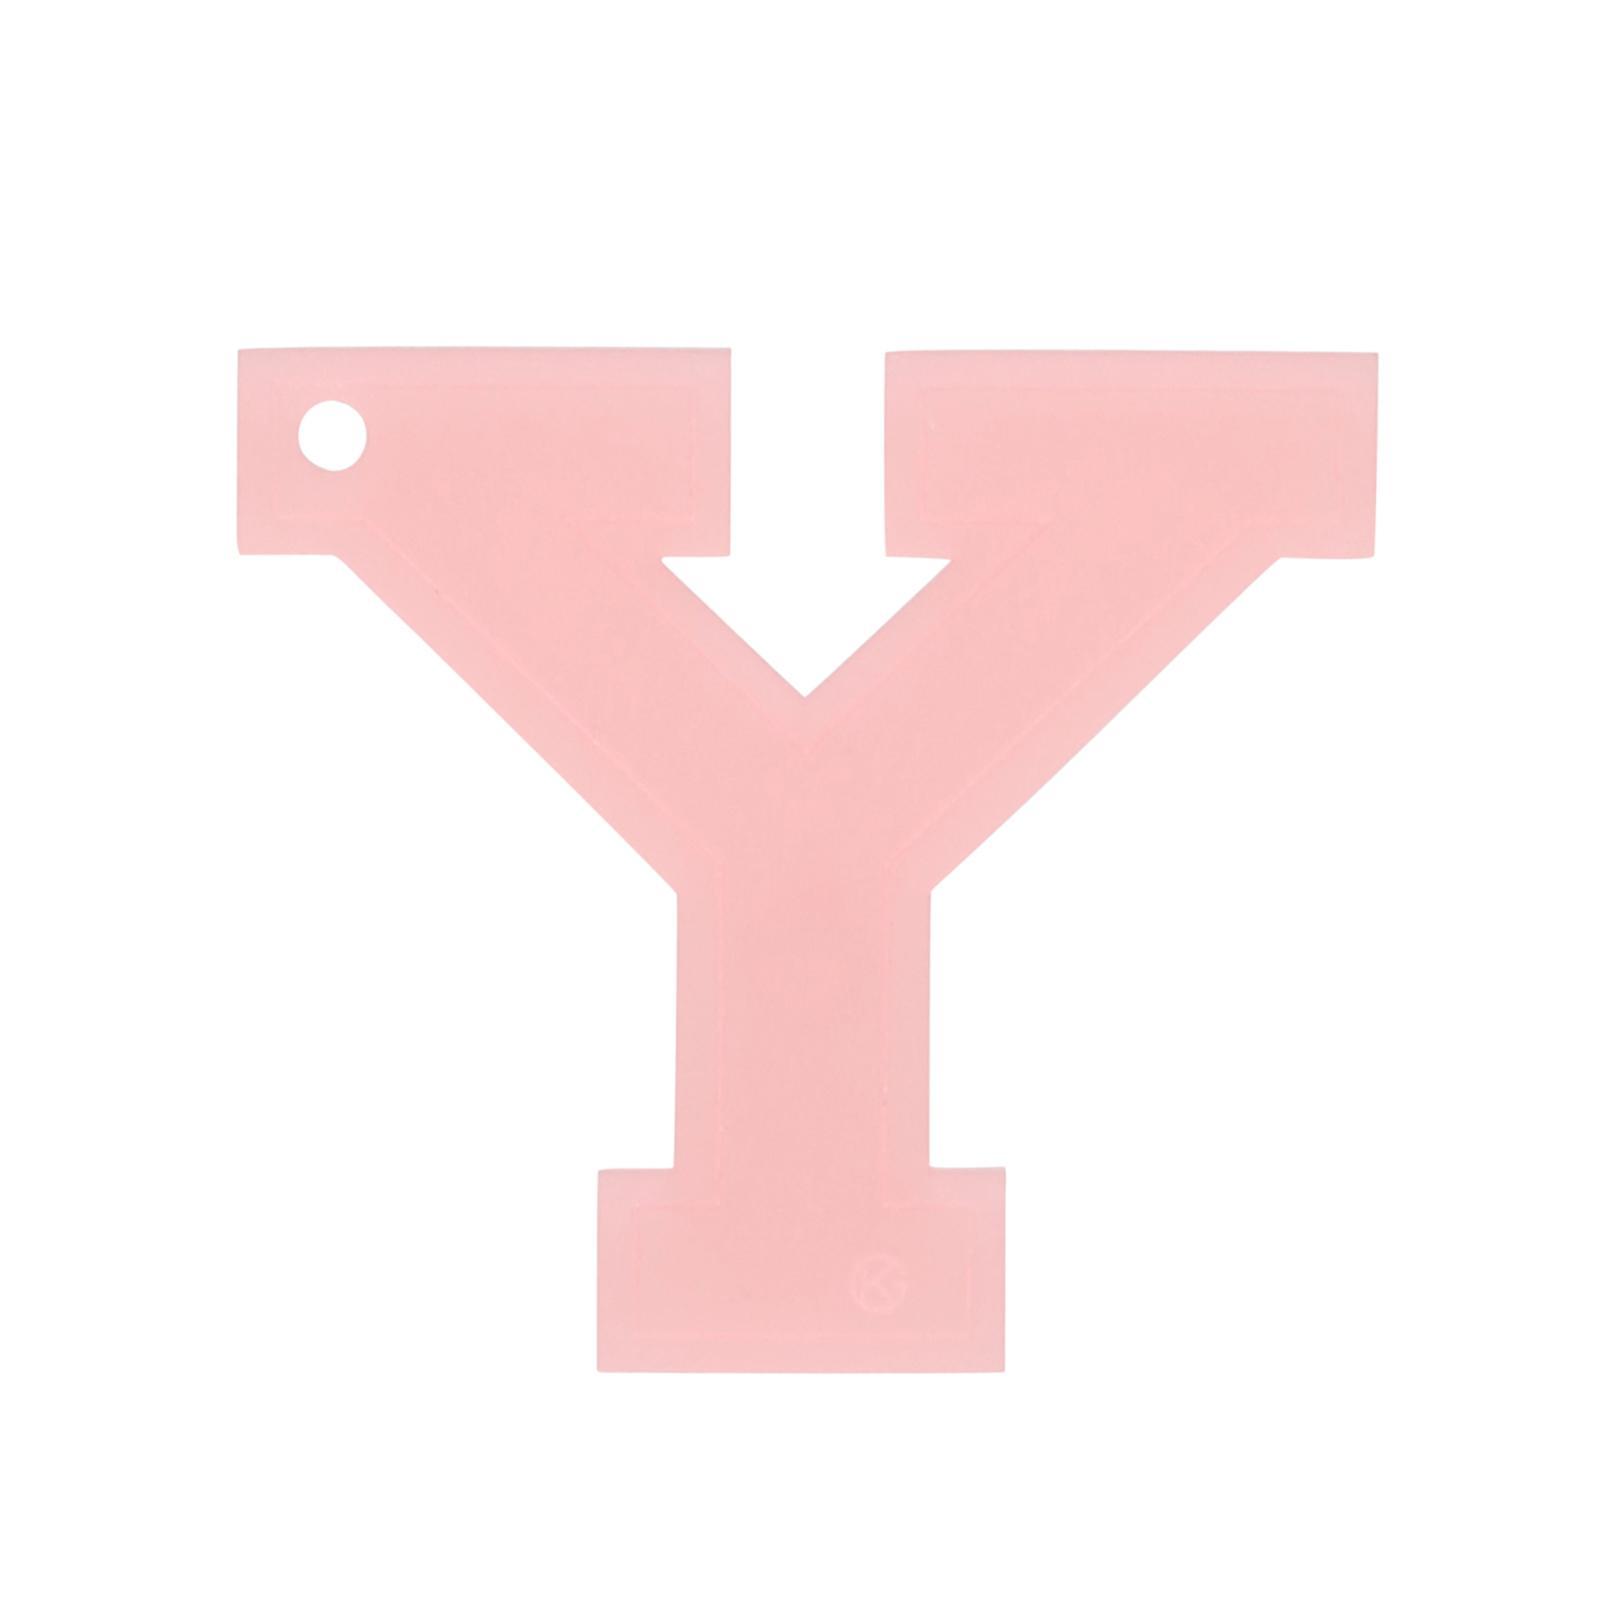 Kurt Geiger Letter Y Charm In Pink